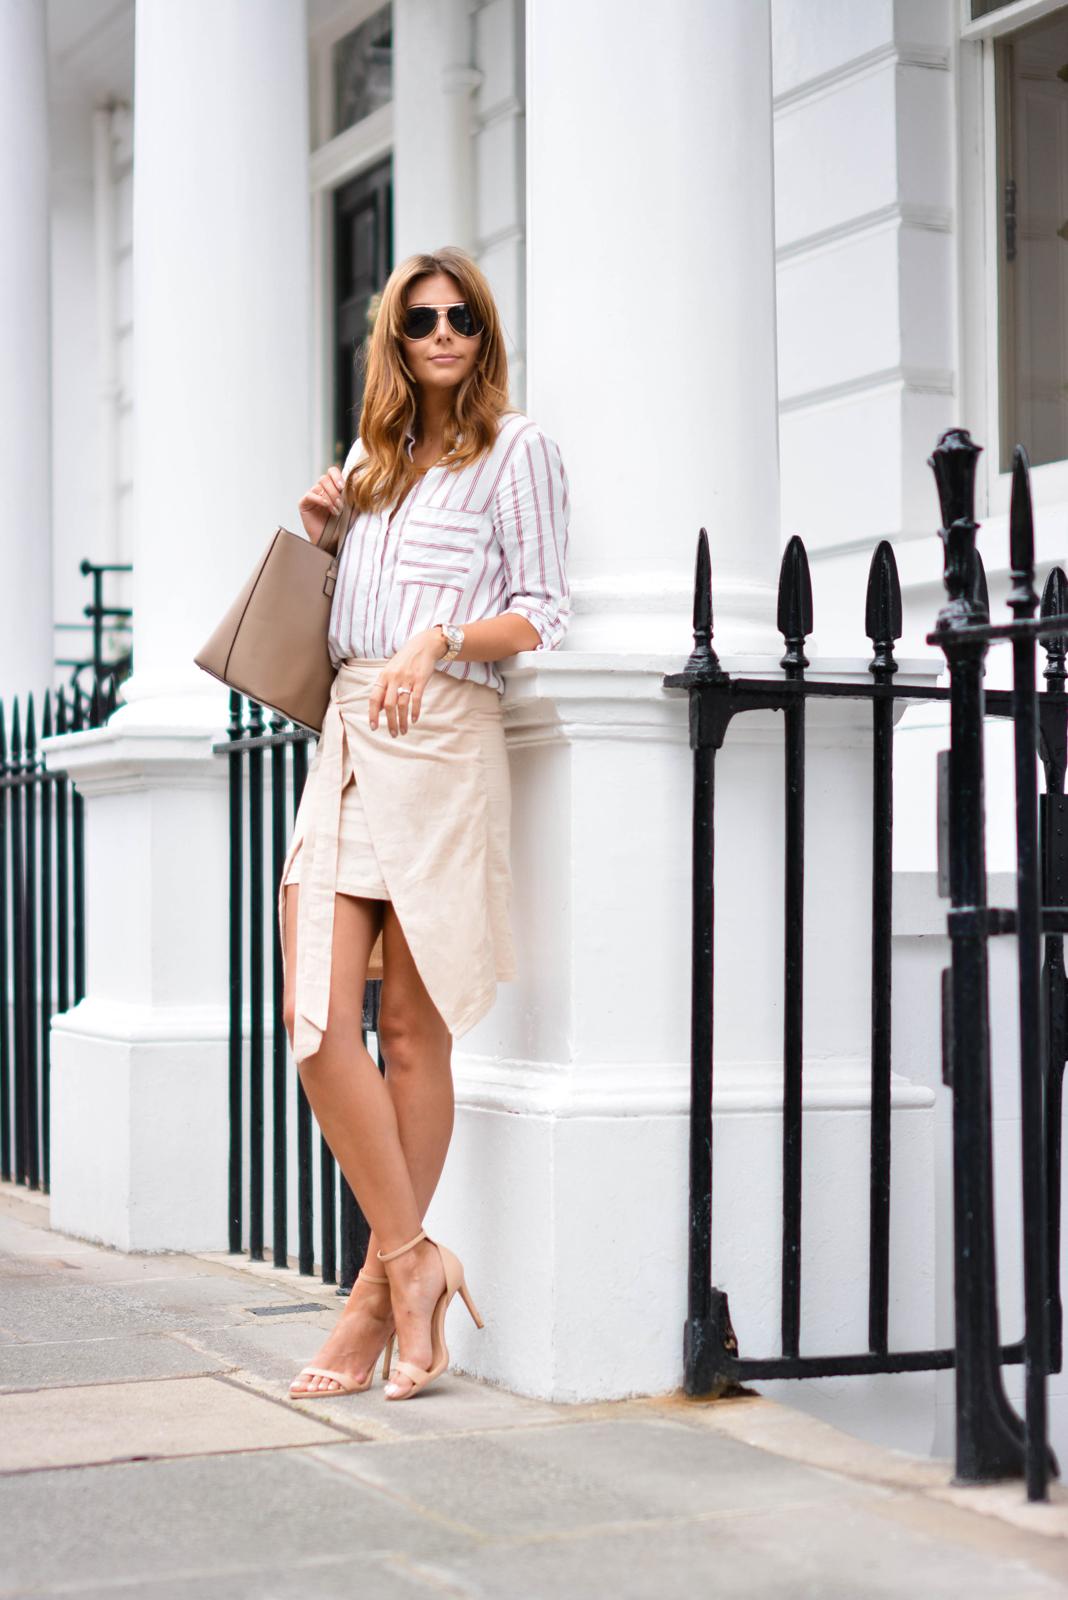 EJSTYLE - Emma Hill wears Zara stripe shirt, beige wrap skirt, nude strappy sandals, Mango saffiano tote bag, aviator sunglasses, Summer OOTD